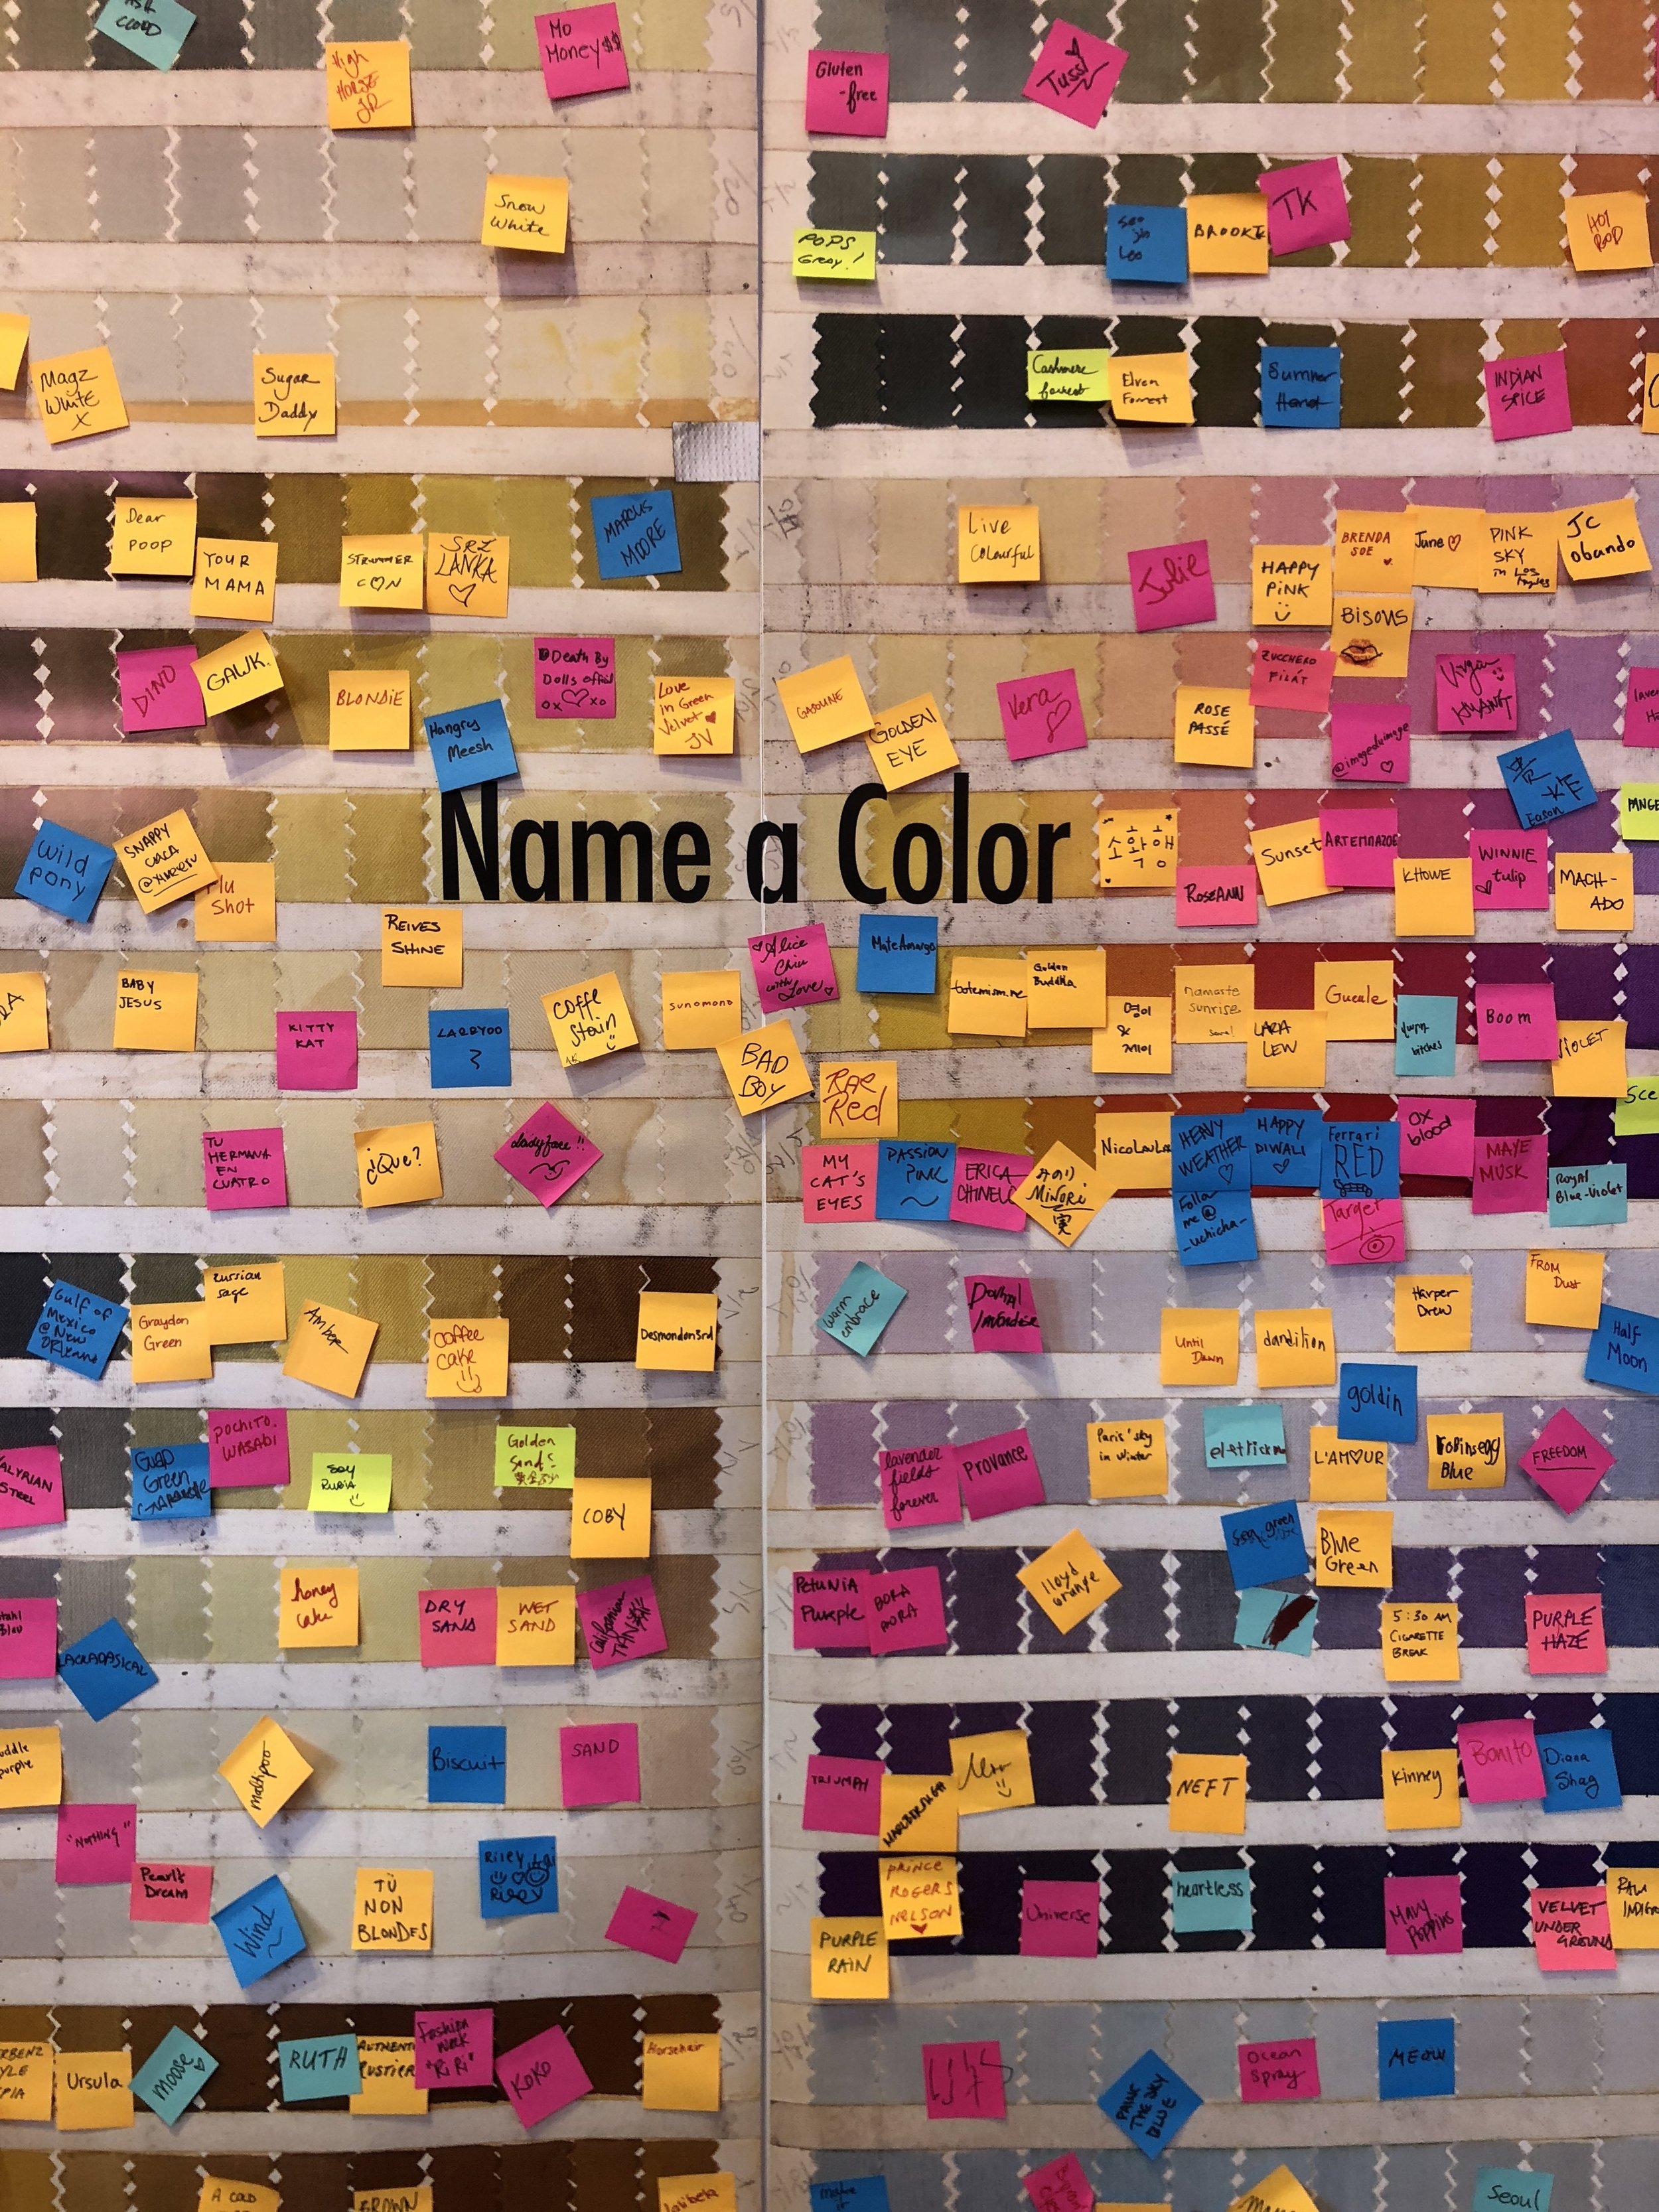 I named my color Malibu.